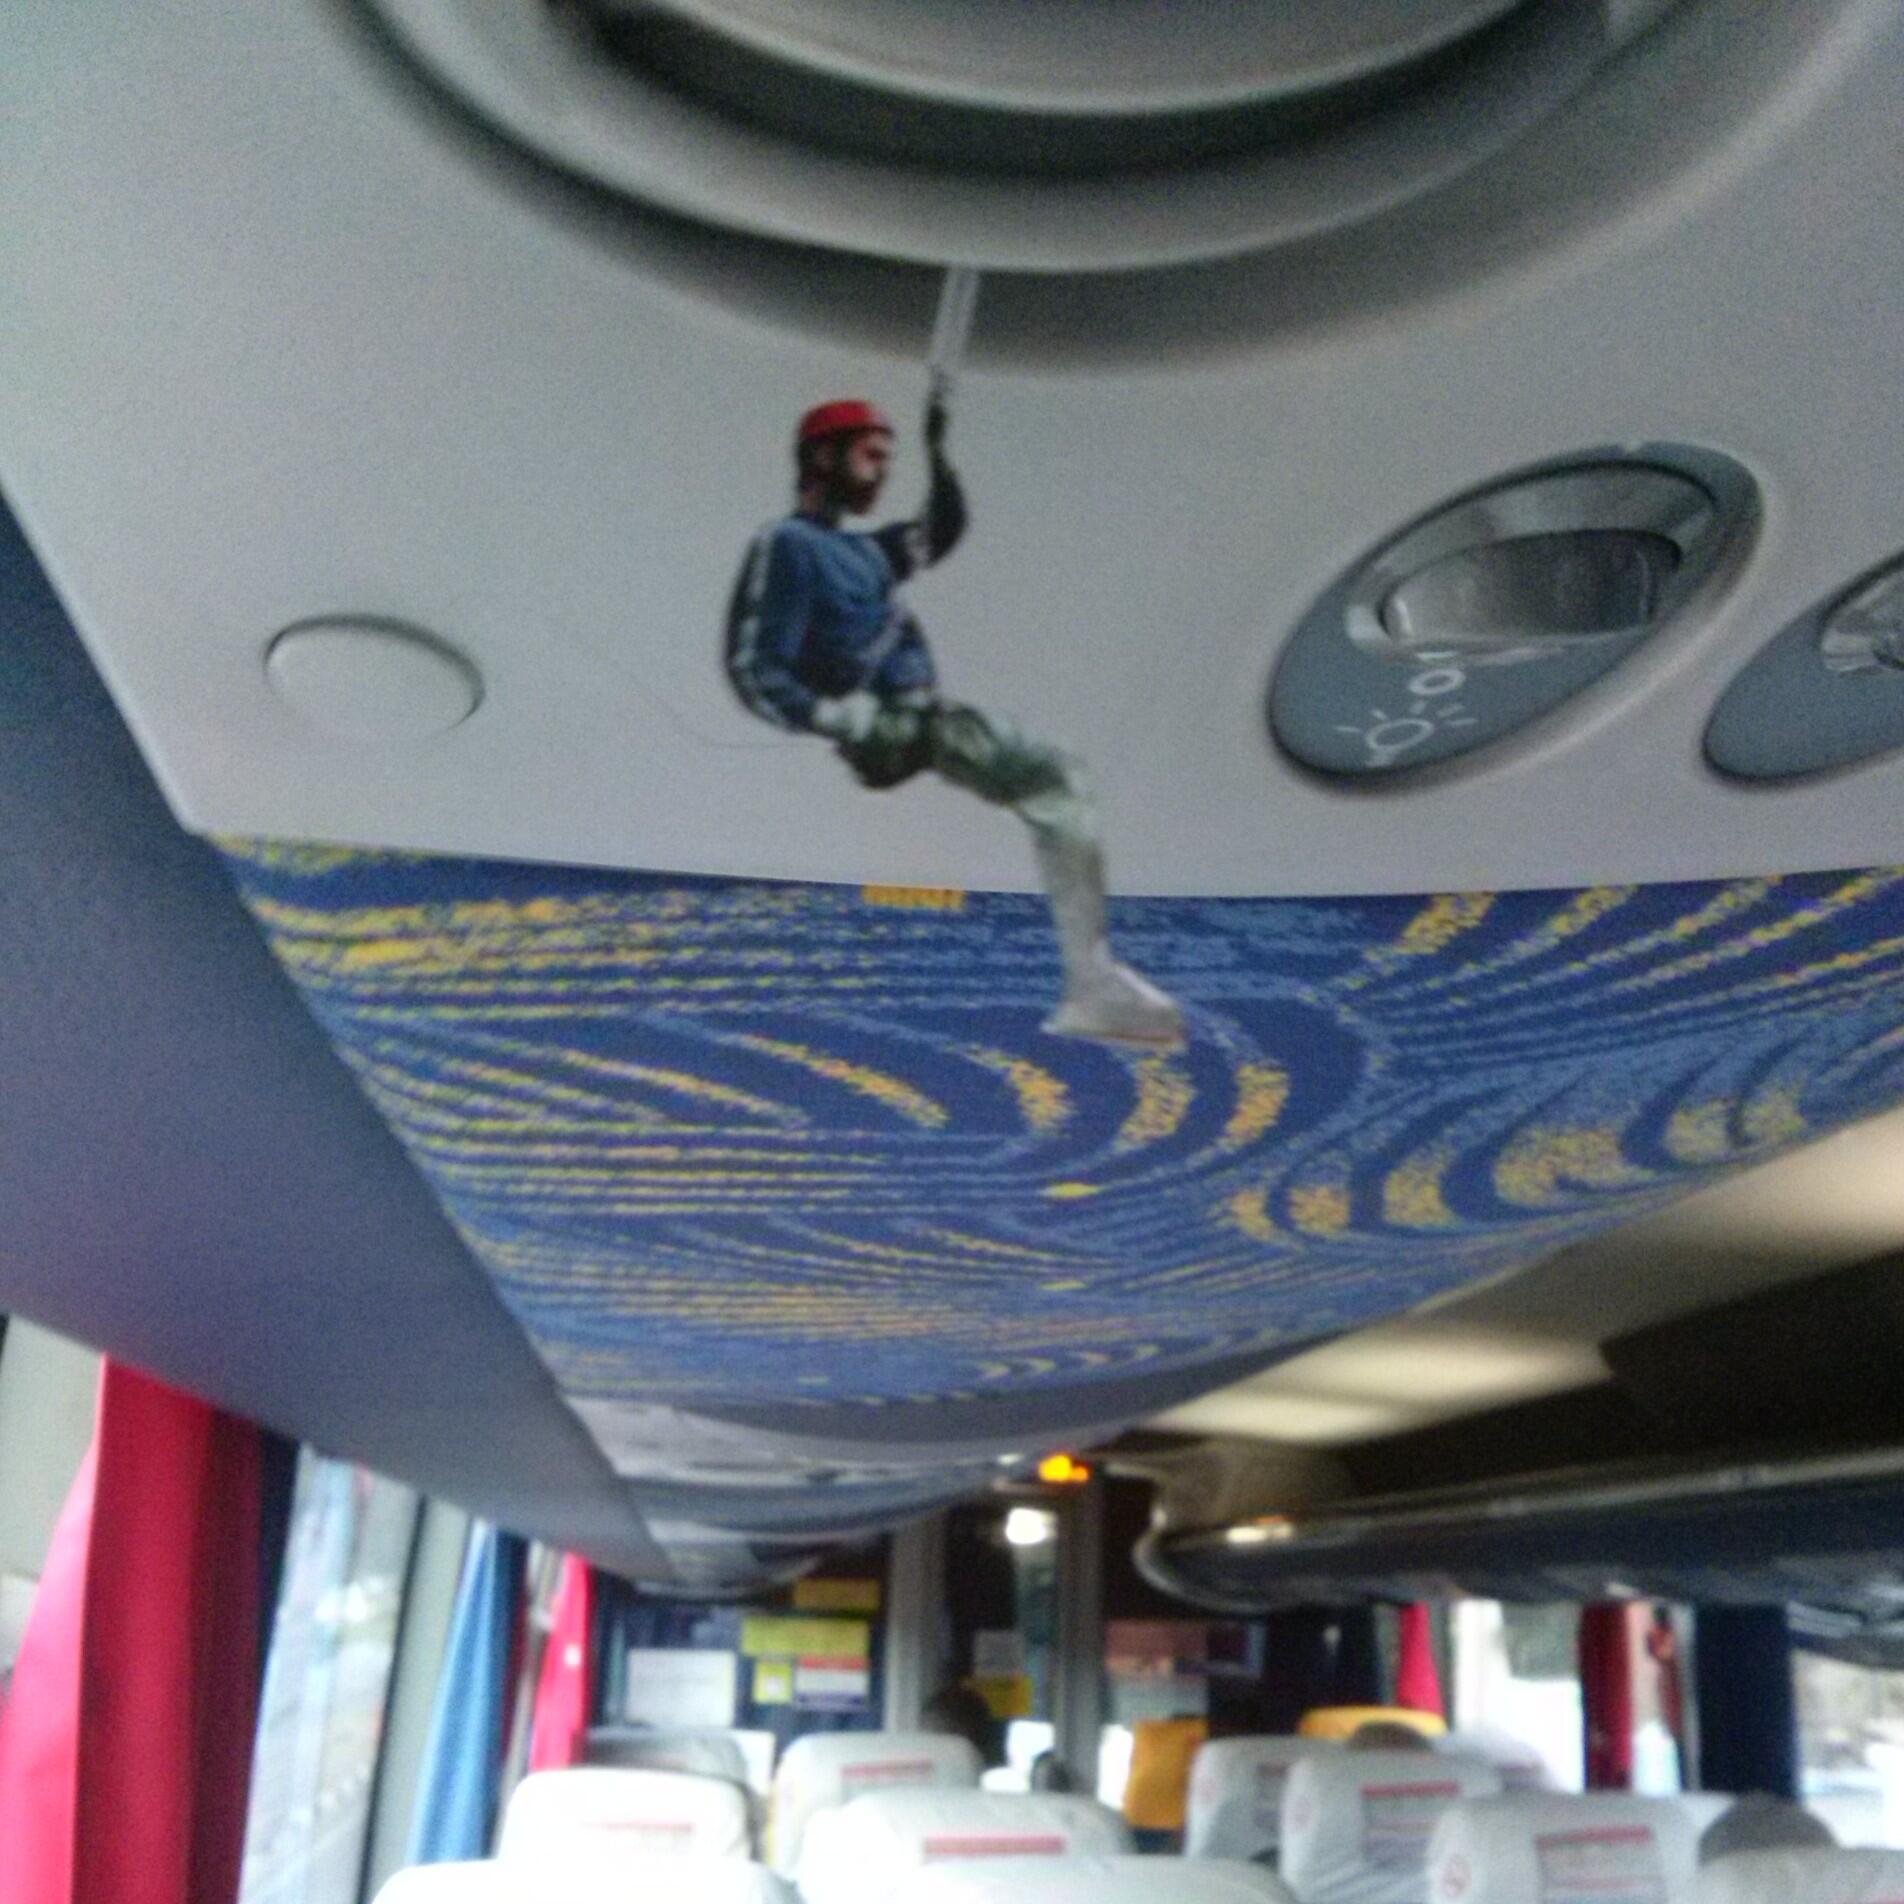 a fotocollage permite rapel dentro do ônibus, por exemplo :) http://t.co/rmHuPnWdOL